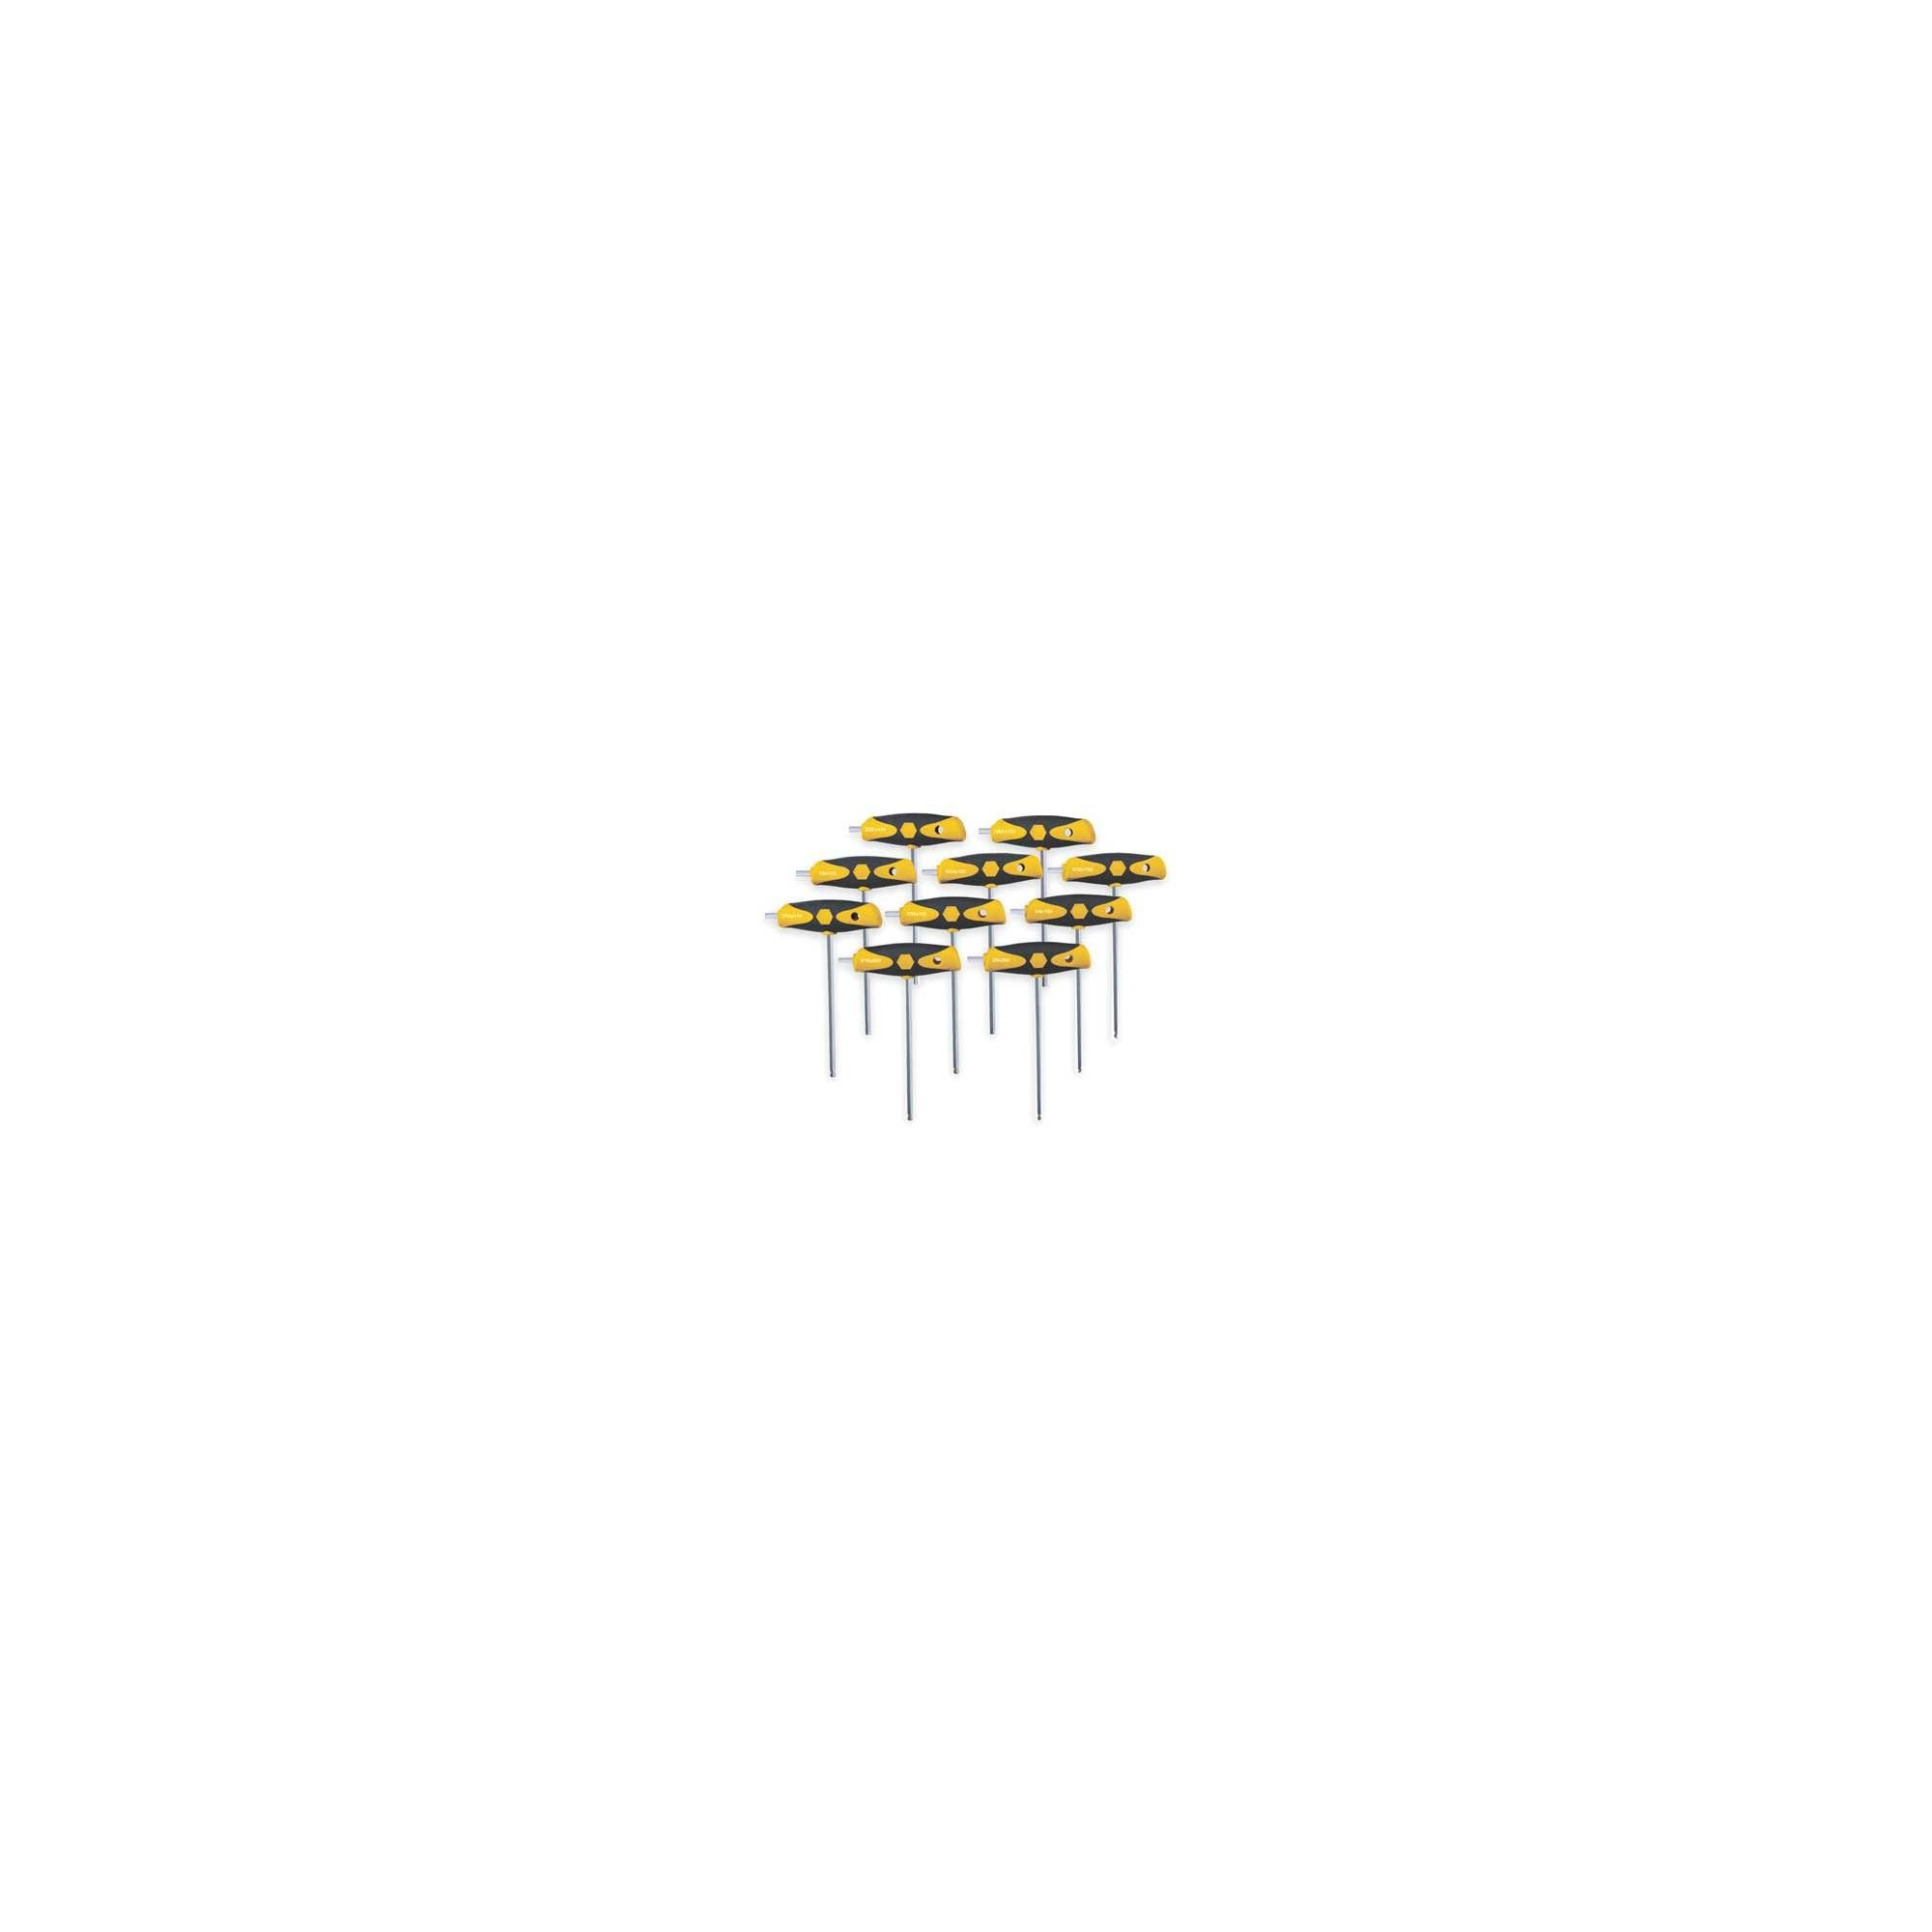 Wiha Tools 54097 10 Pc Sae Ball End Soft Grip T Handle Hex Key Set Hex Key Hex Grip